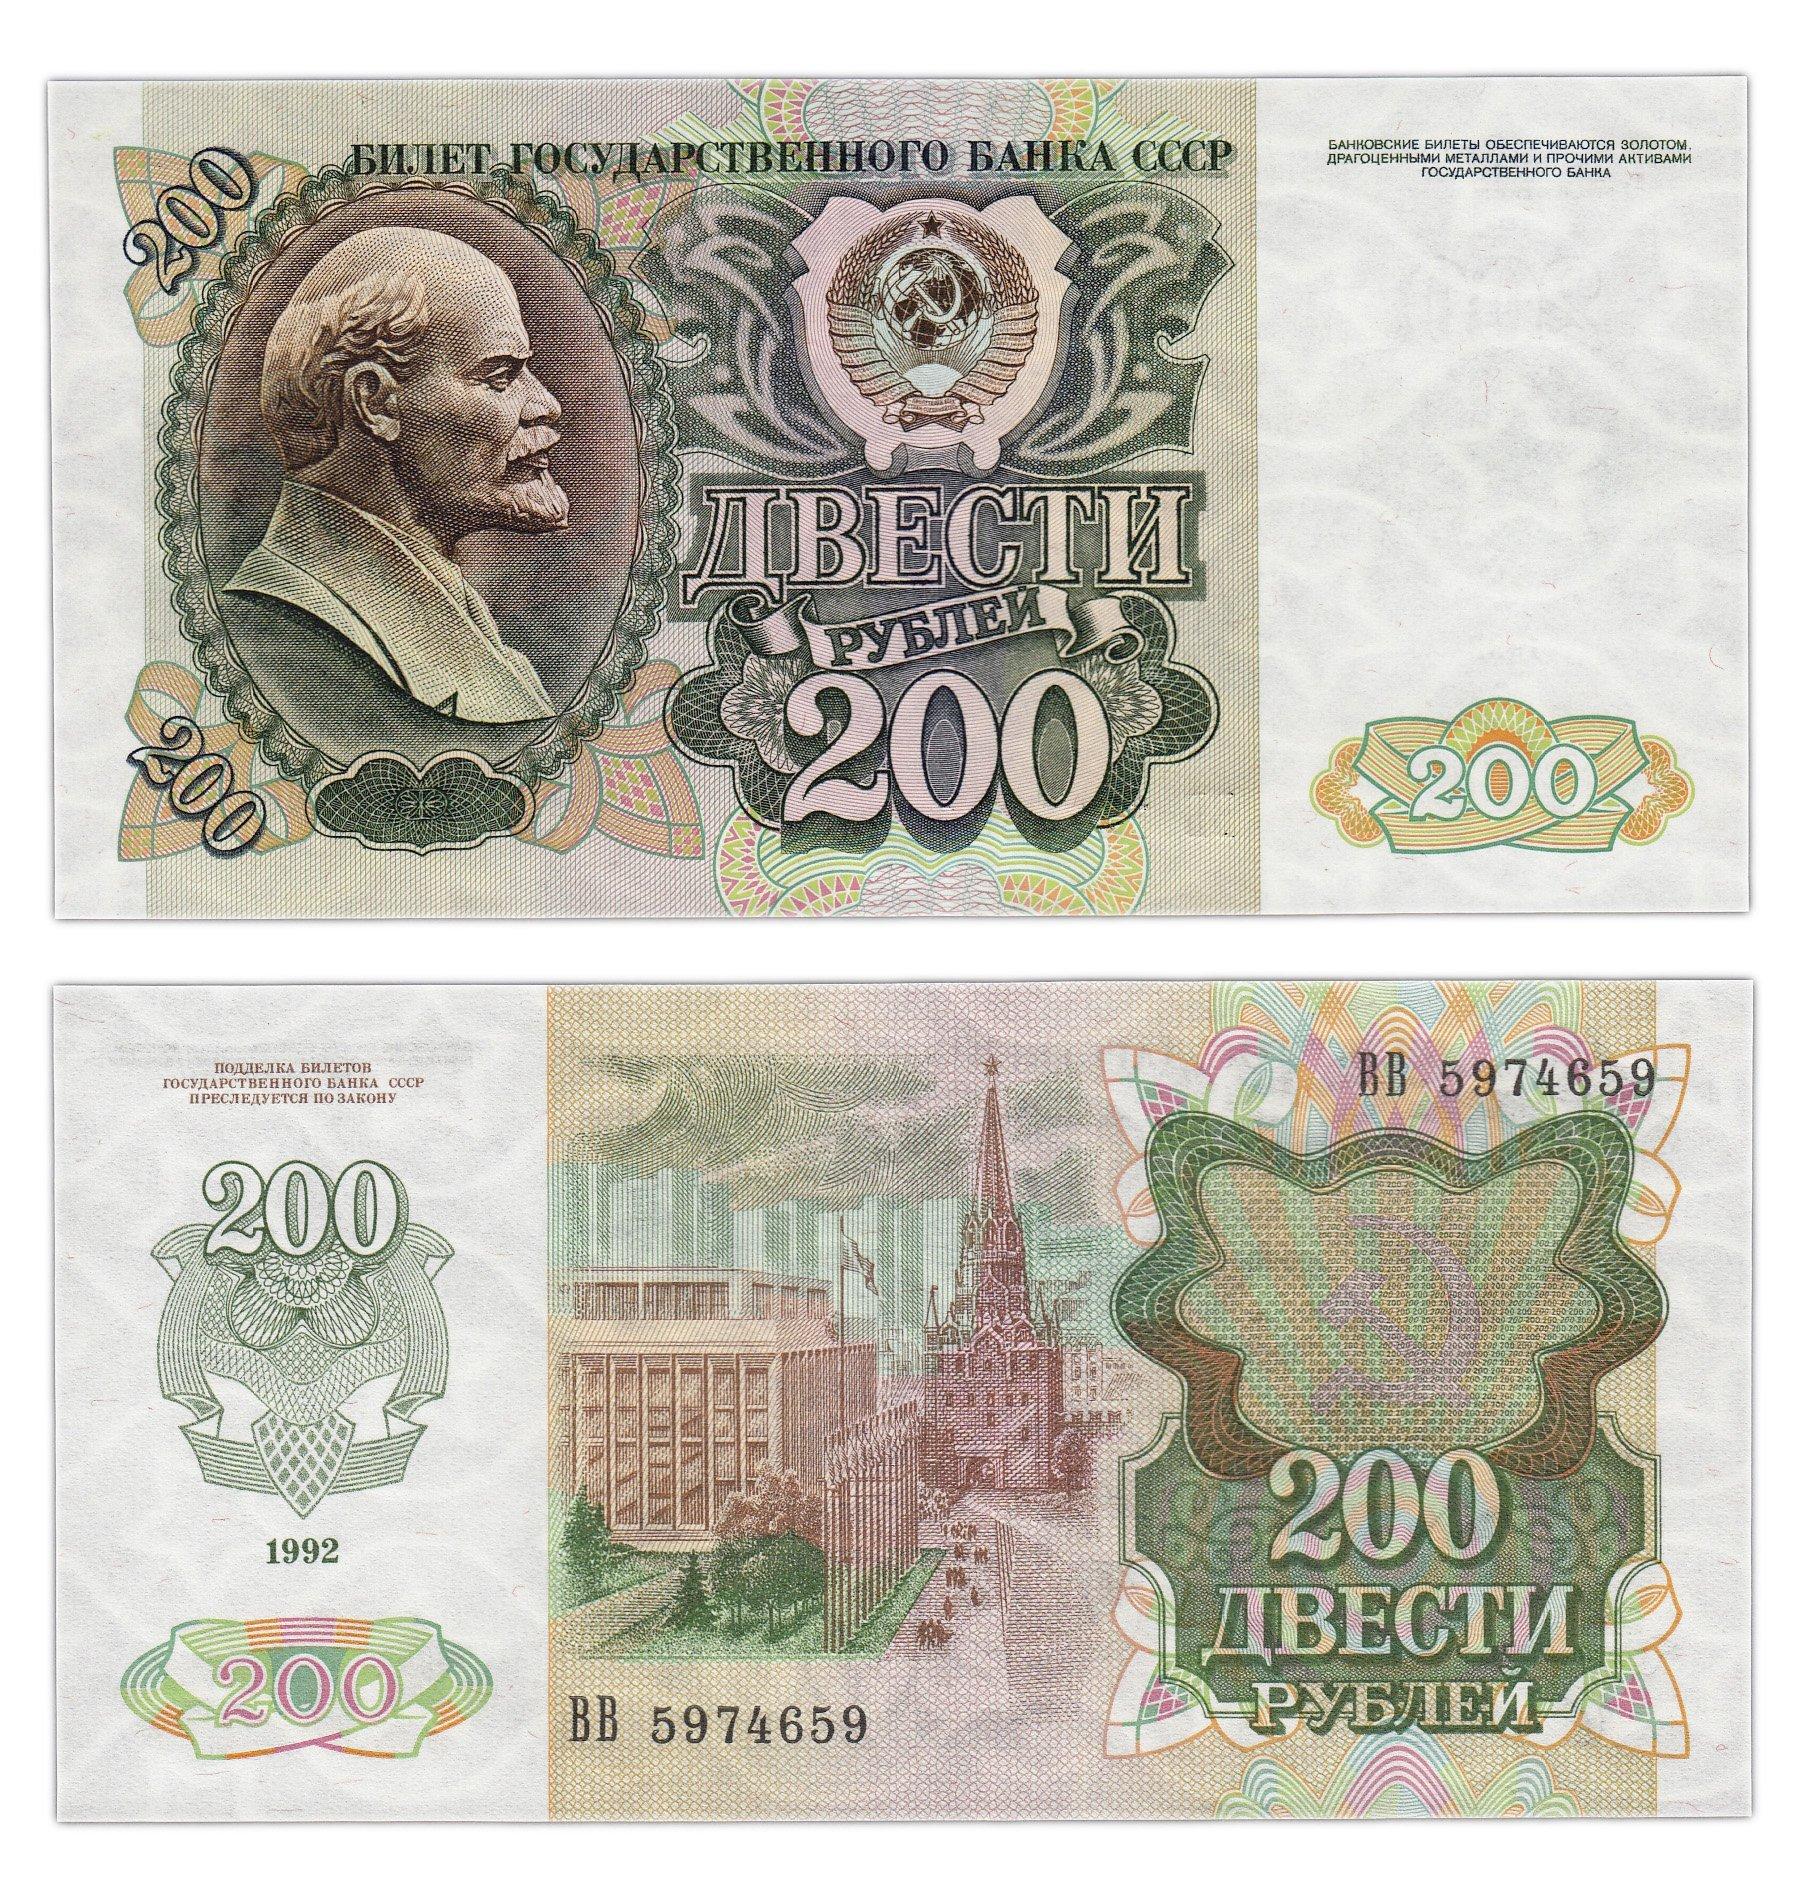 Е 25 за 200 рублей купить купить премиум скорпион g